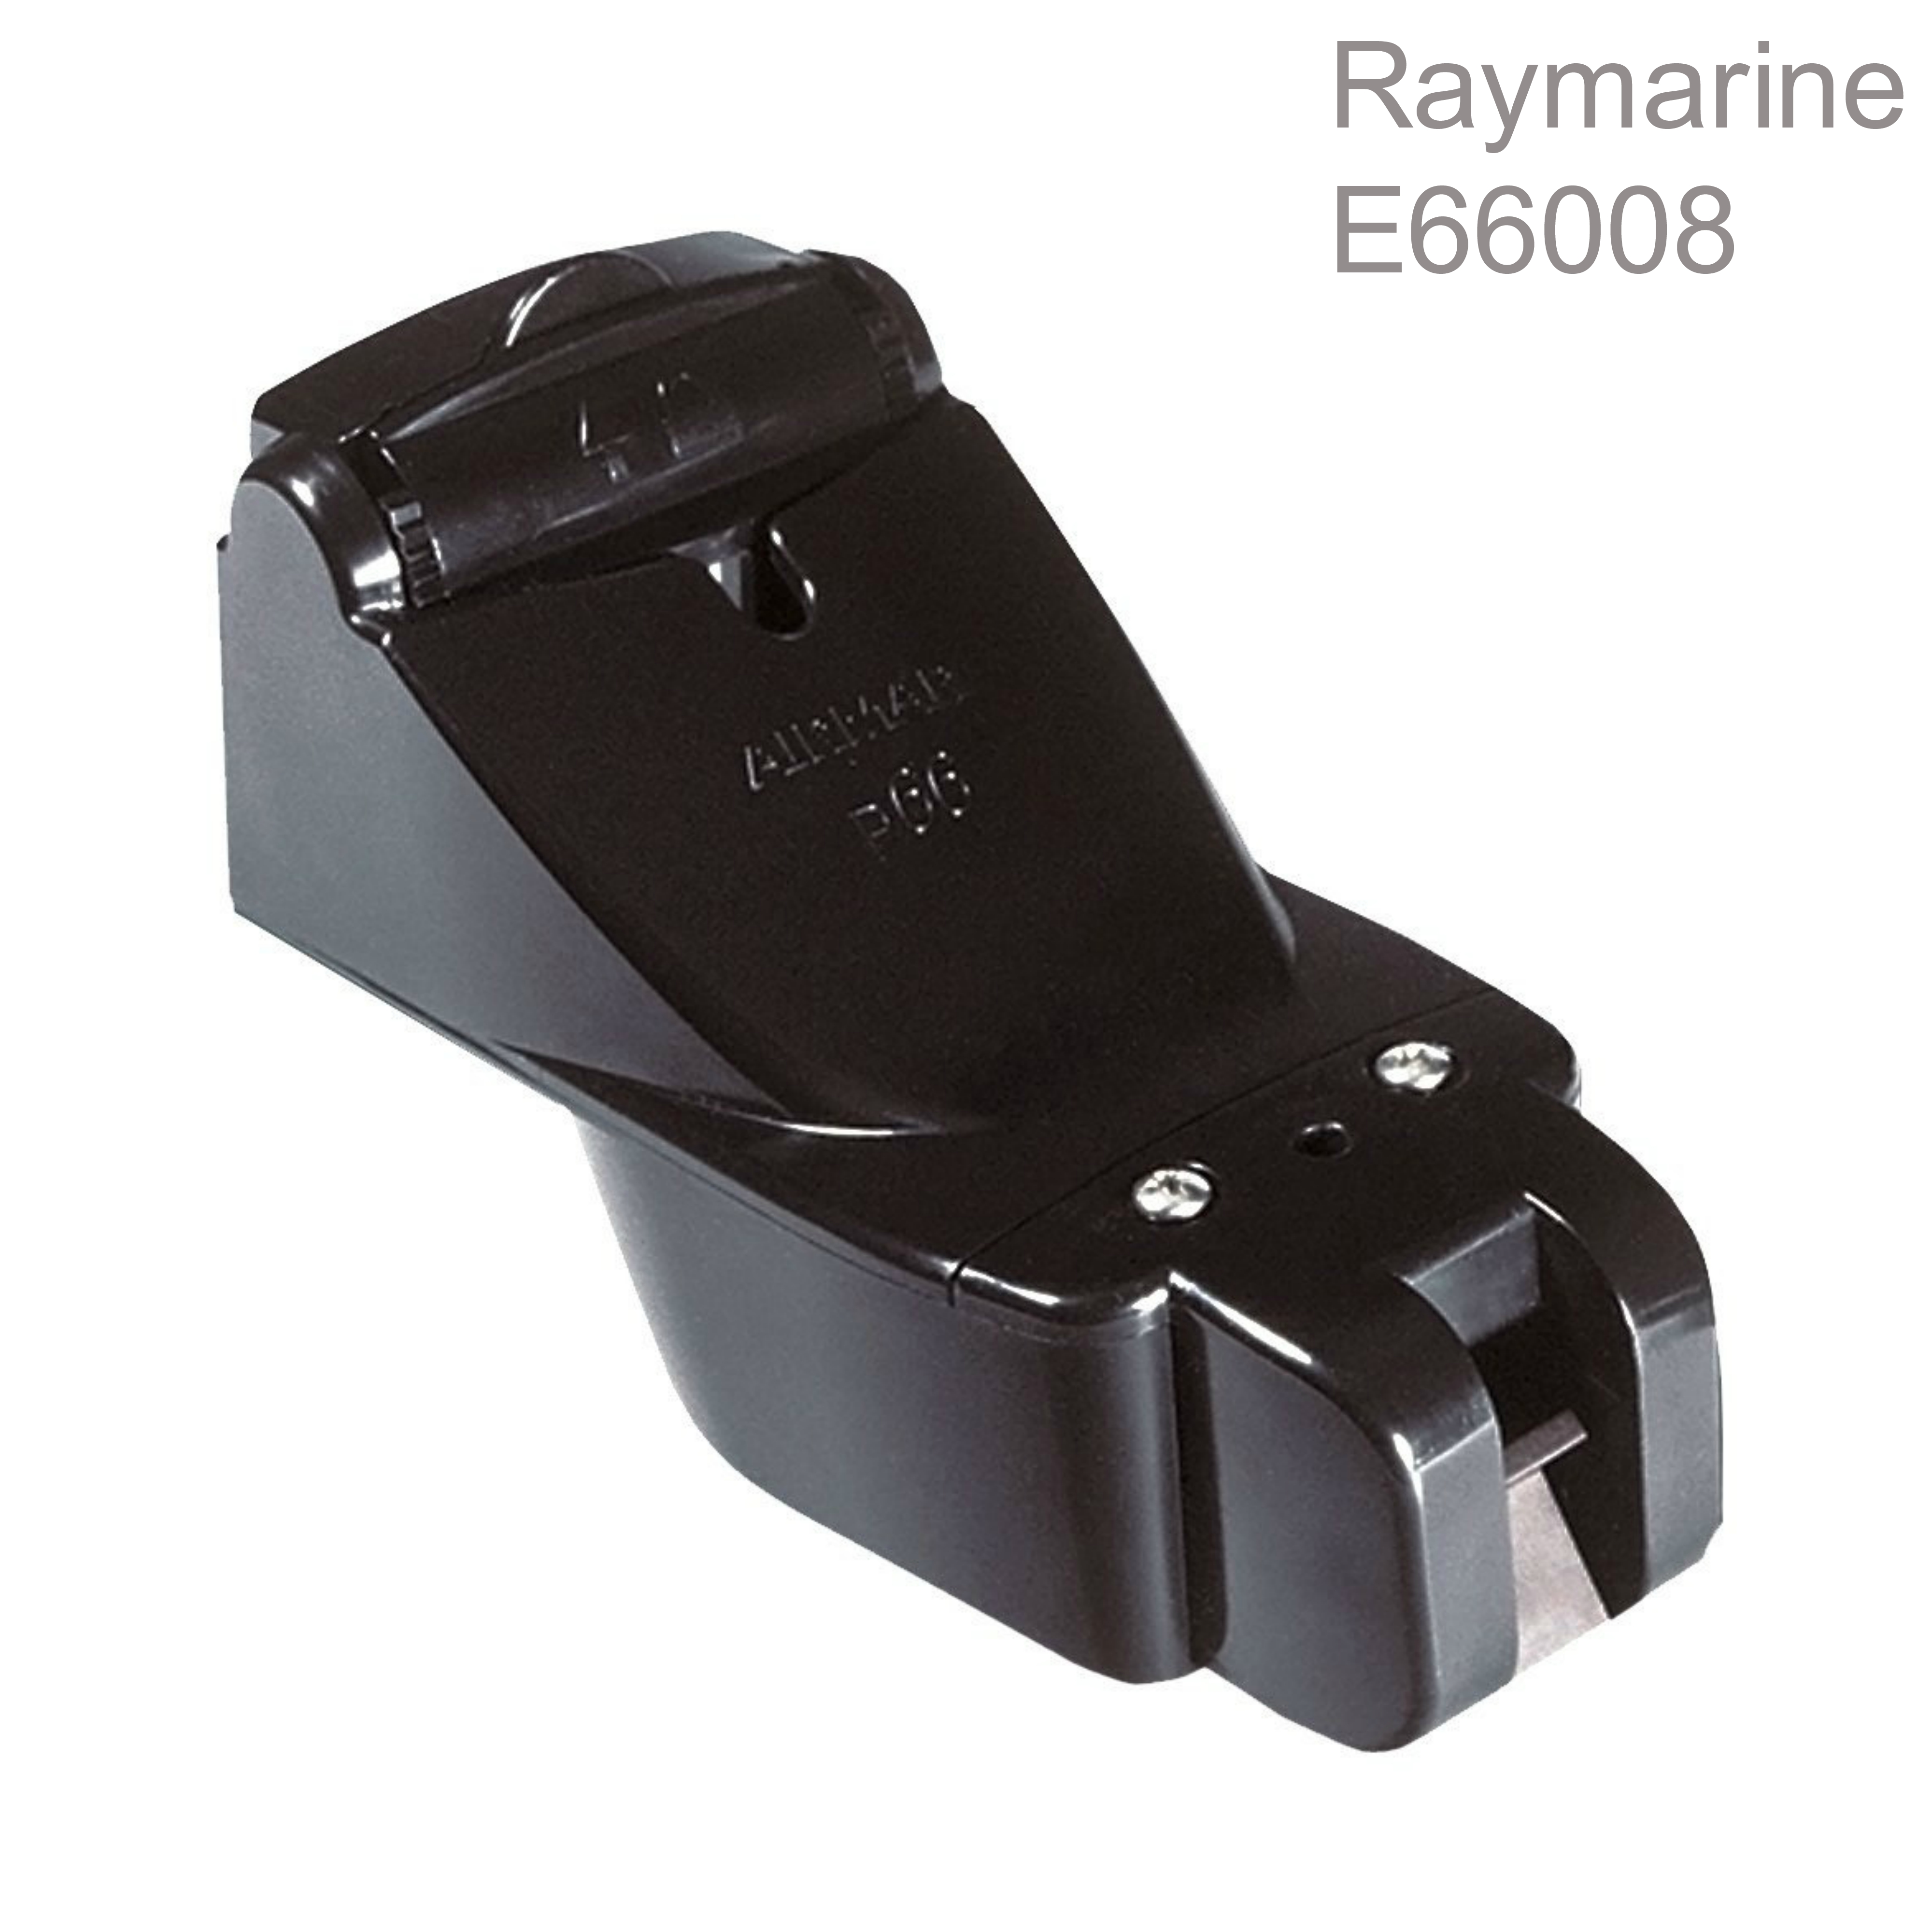 Raymarine-E66054|P66 600W Transom Mount Sonar Transducer|Depth/Speed/Temp|50/200 KHZ